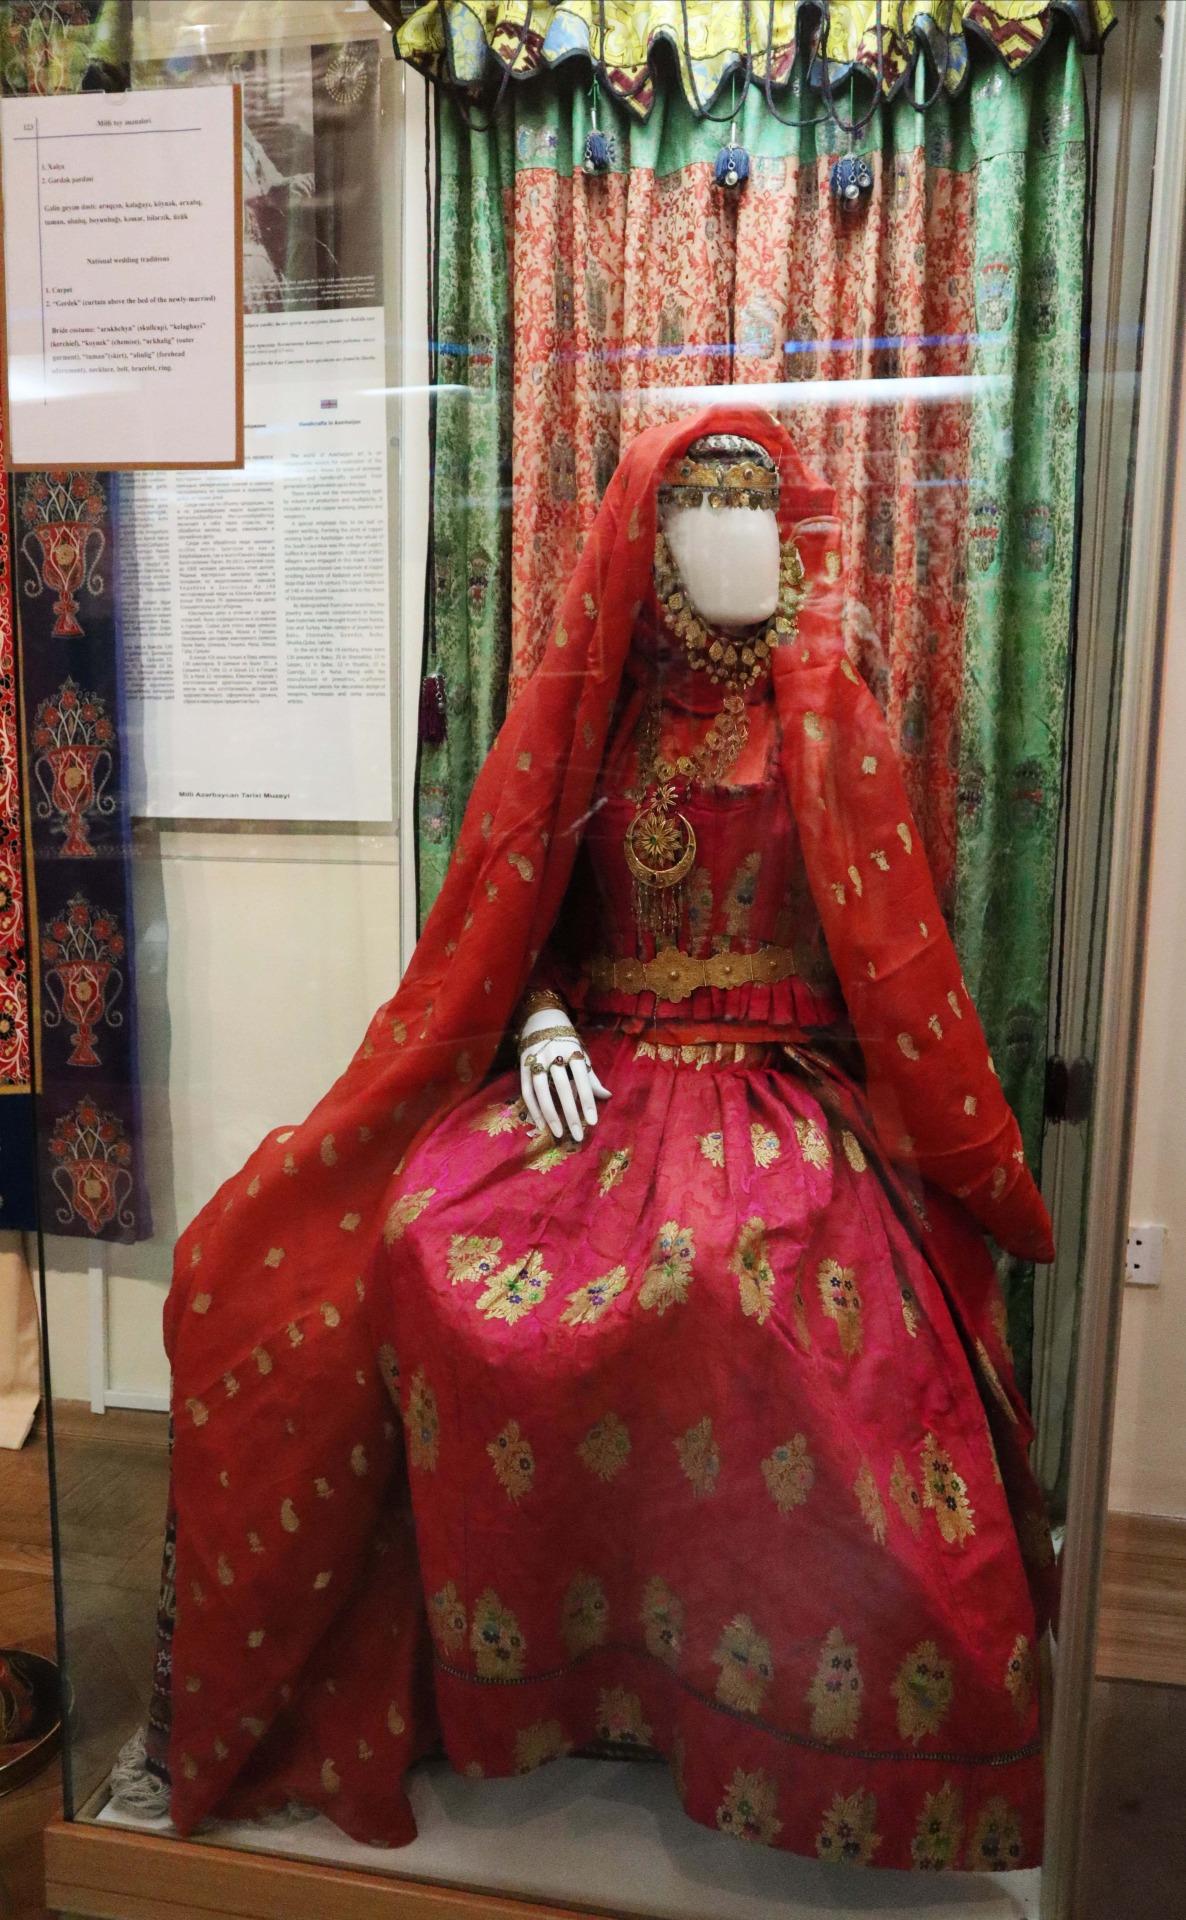 On display at the National Museum of History of Azerbaijan, a traditional Azerbaijani bridal dress.